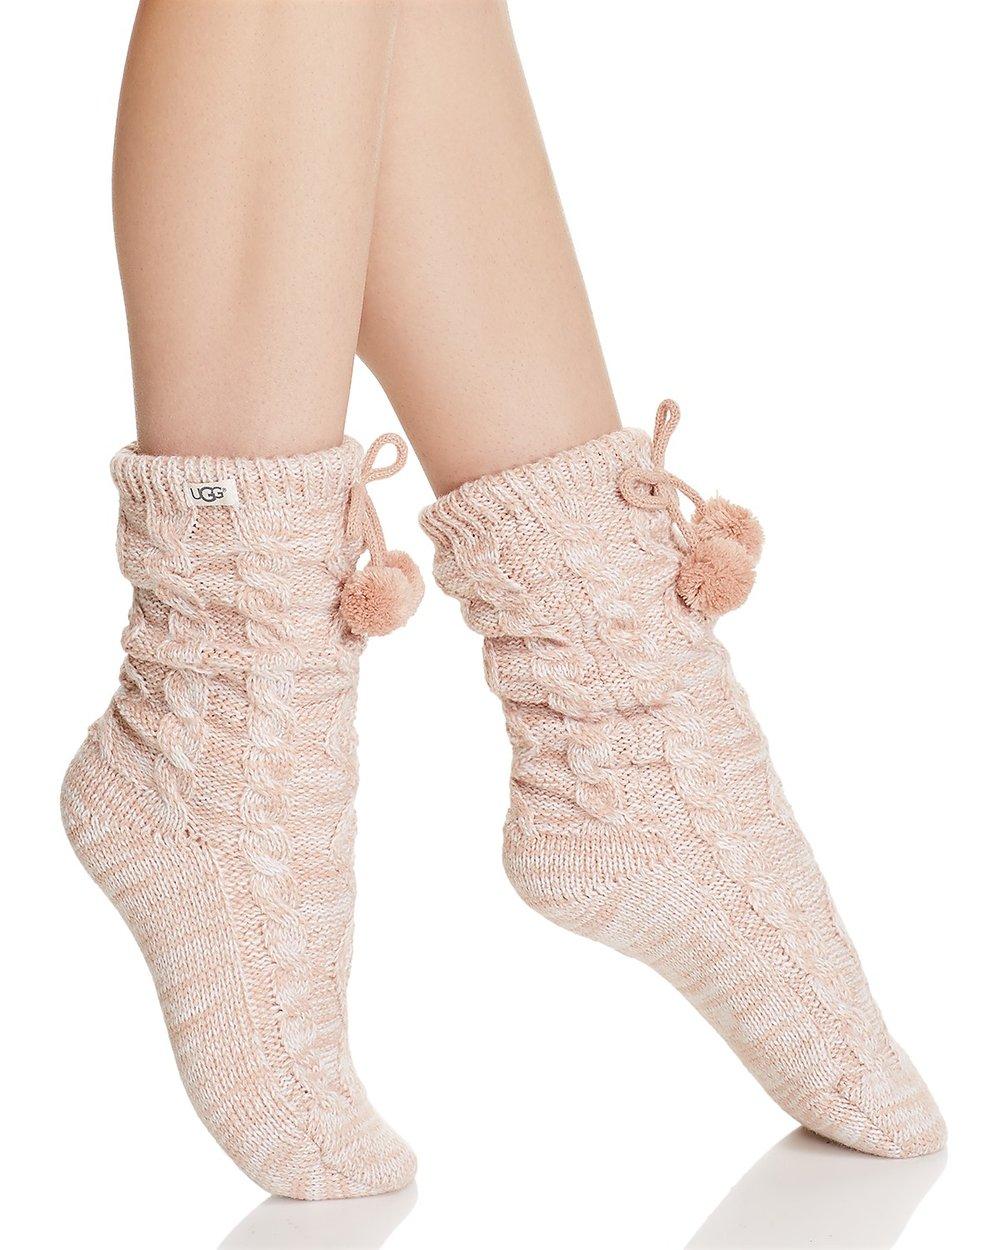 Pom-Pom Fleece Lined Socks - UGG